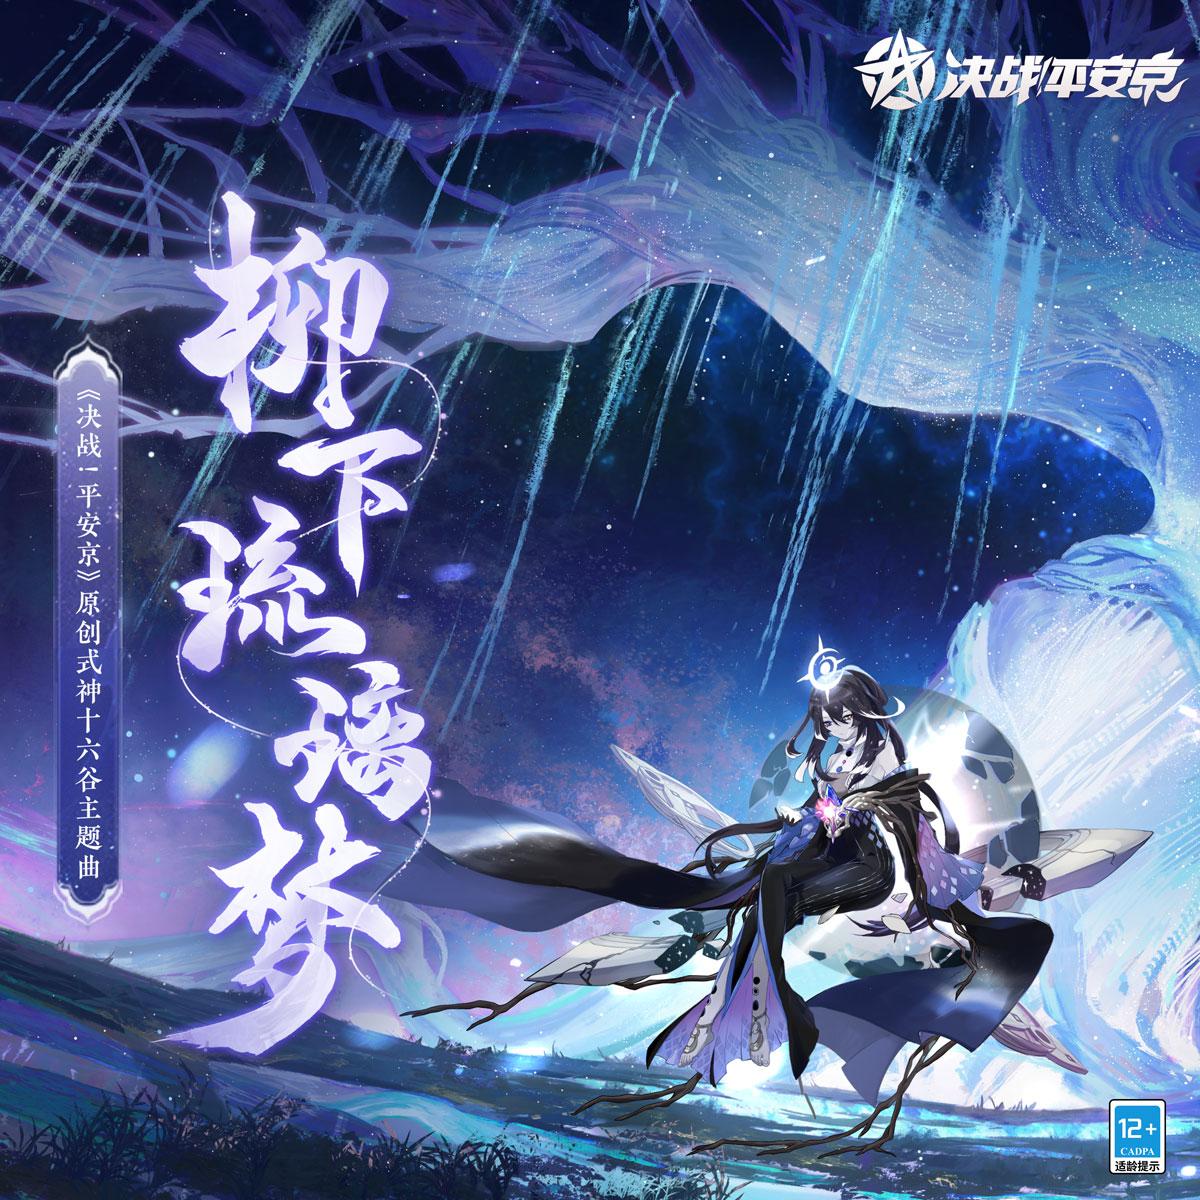 ゲーム「決戦!平安京」十六谷主題歌